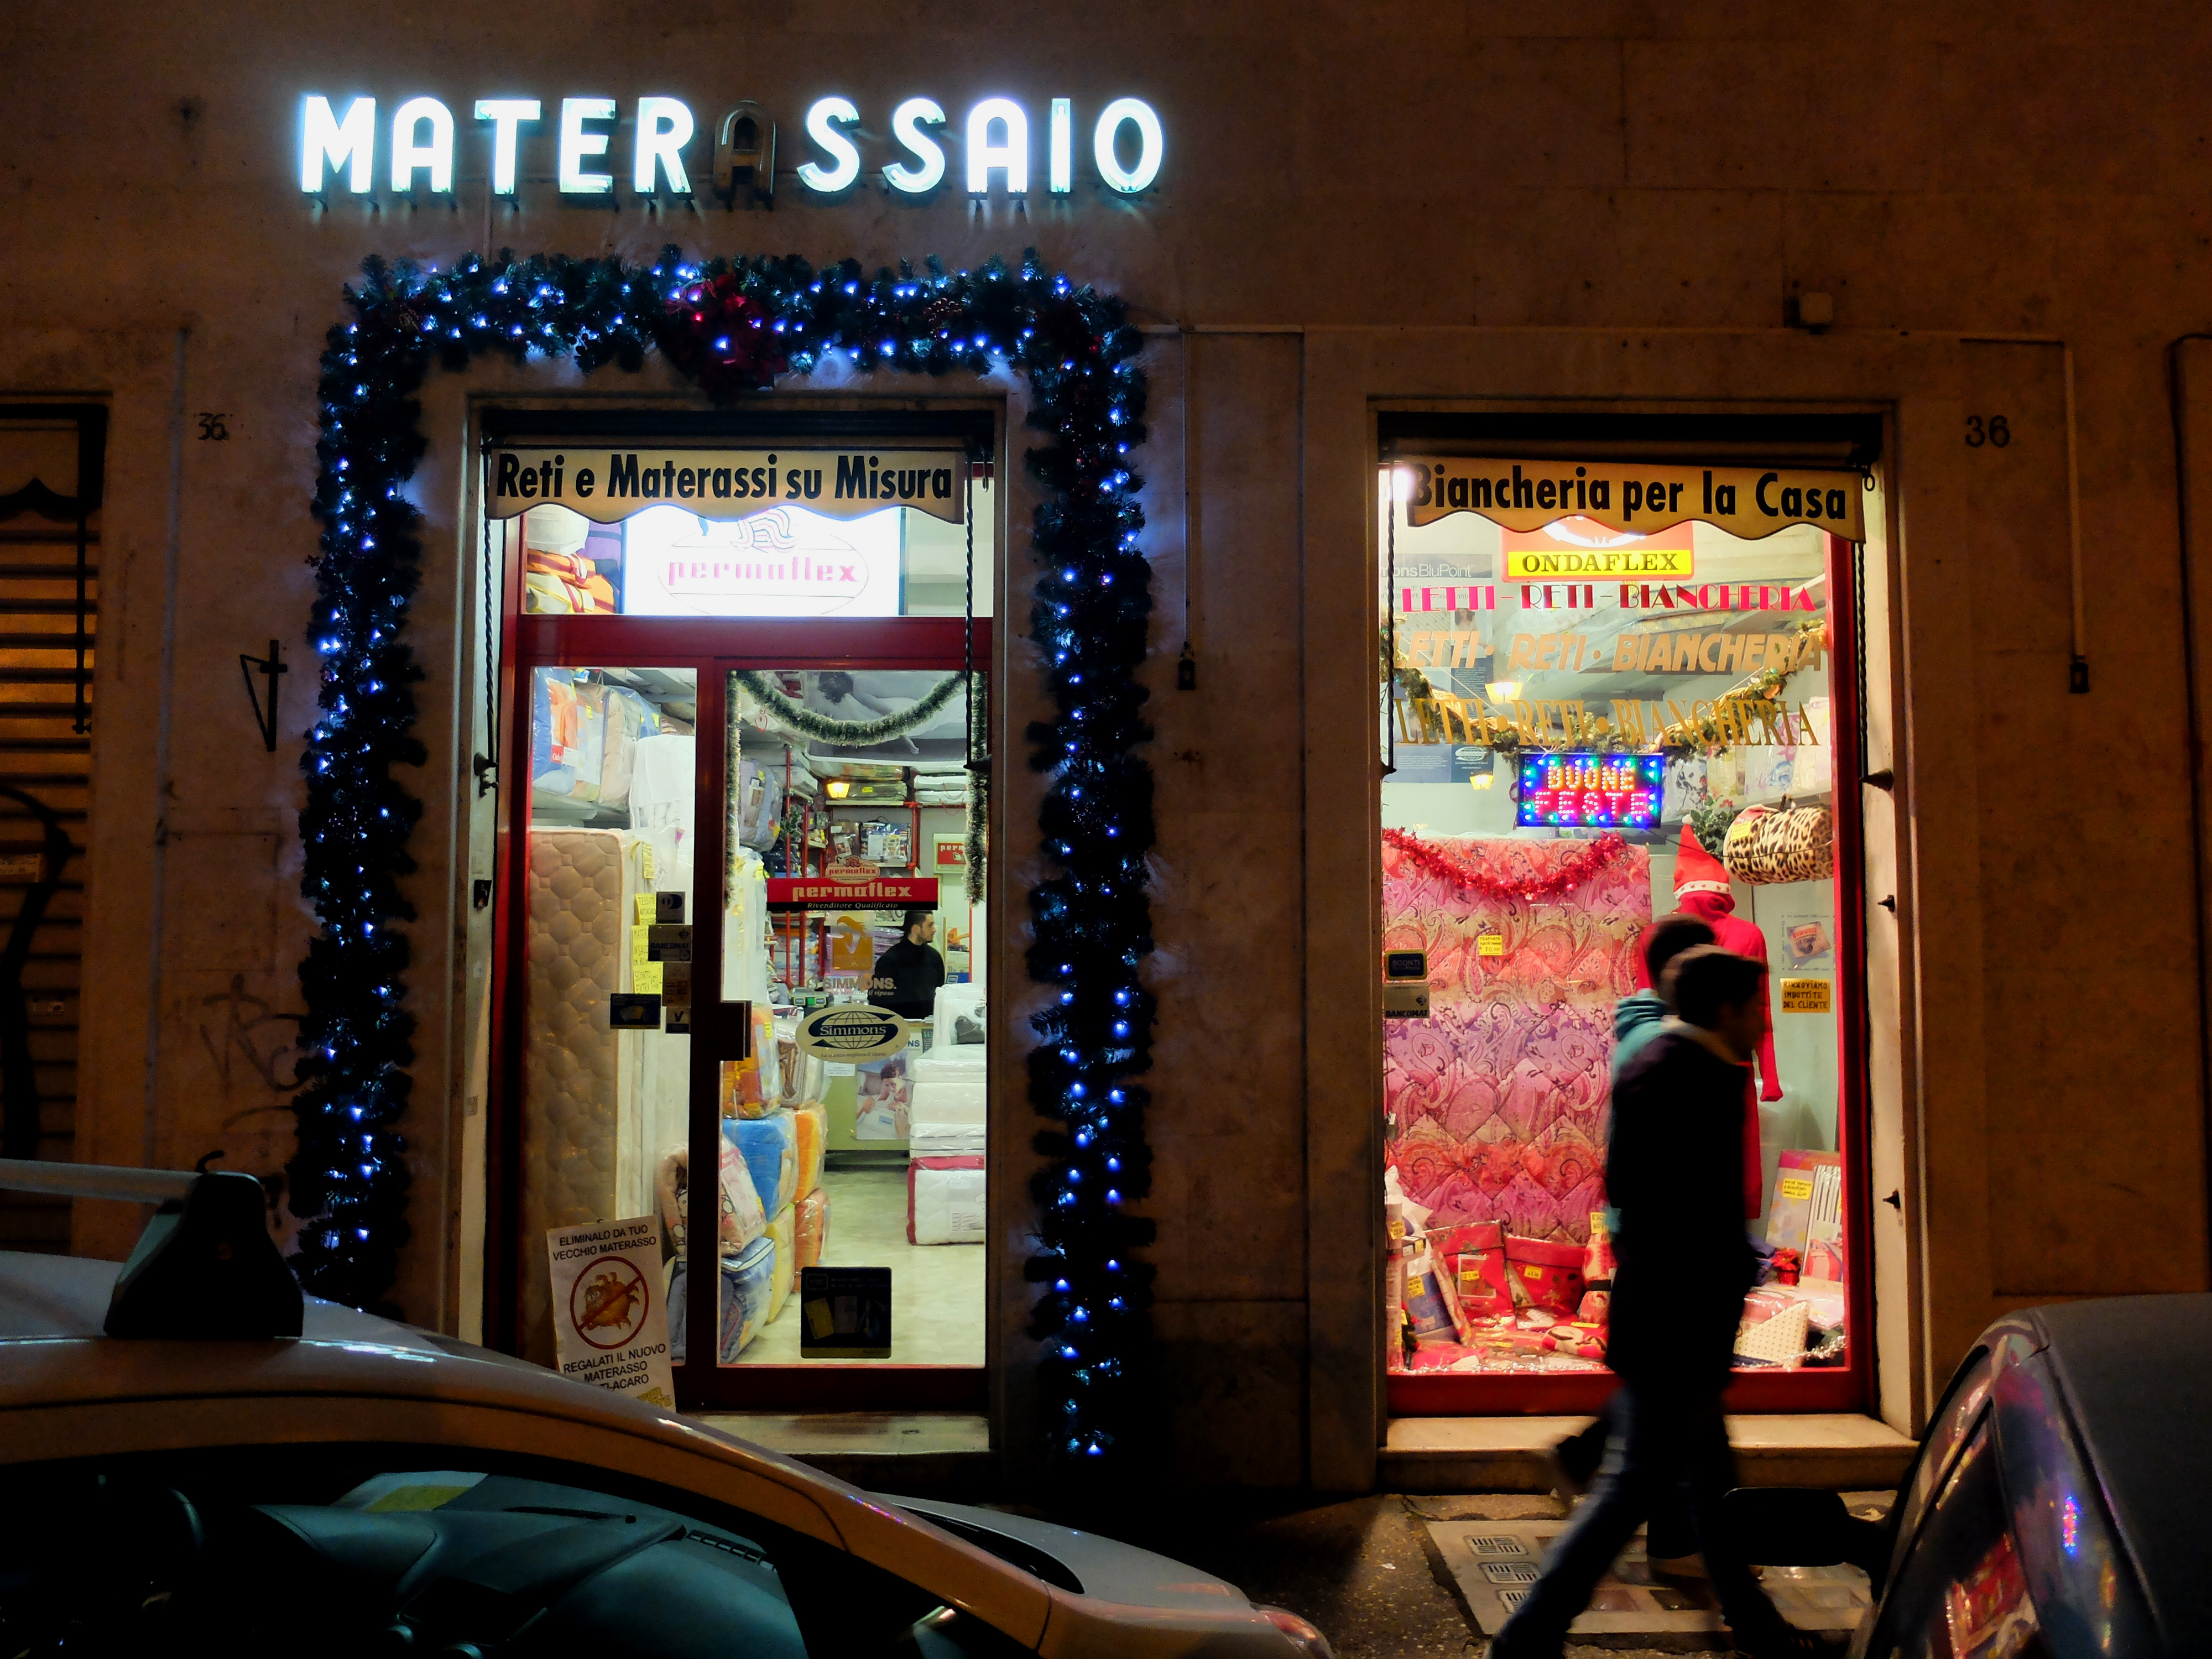 matterassaio Christmas